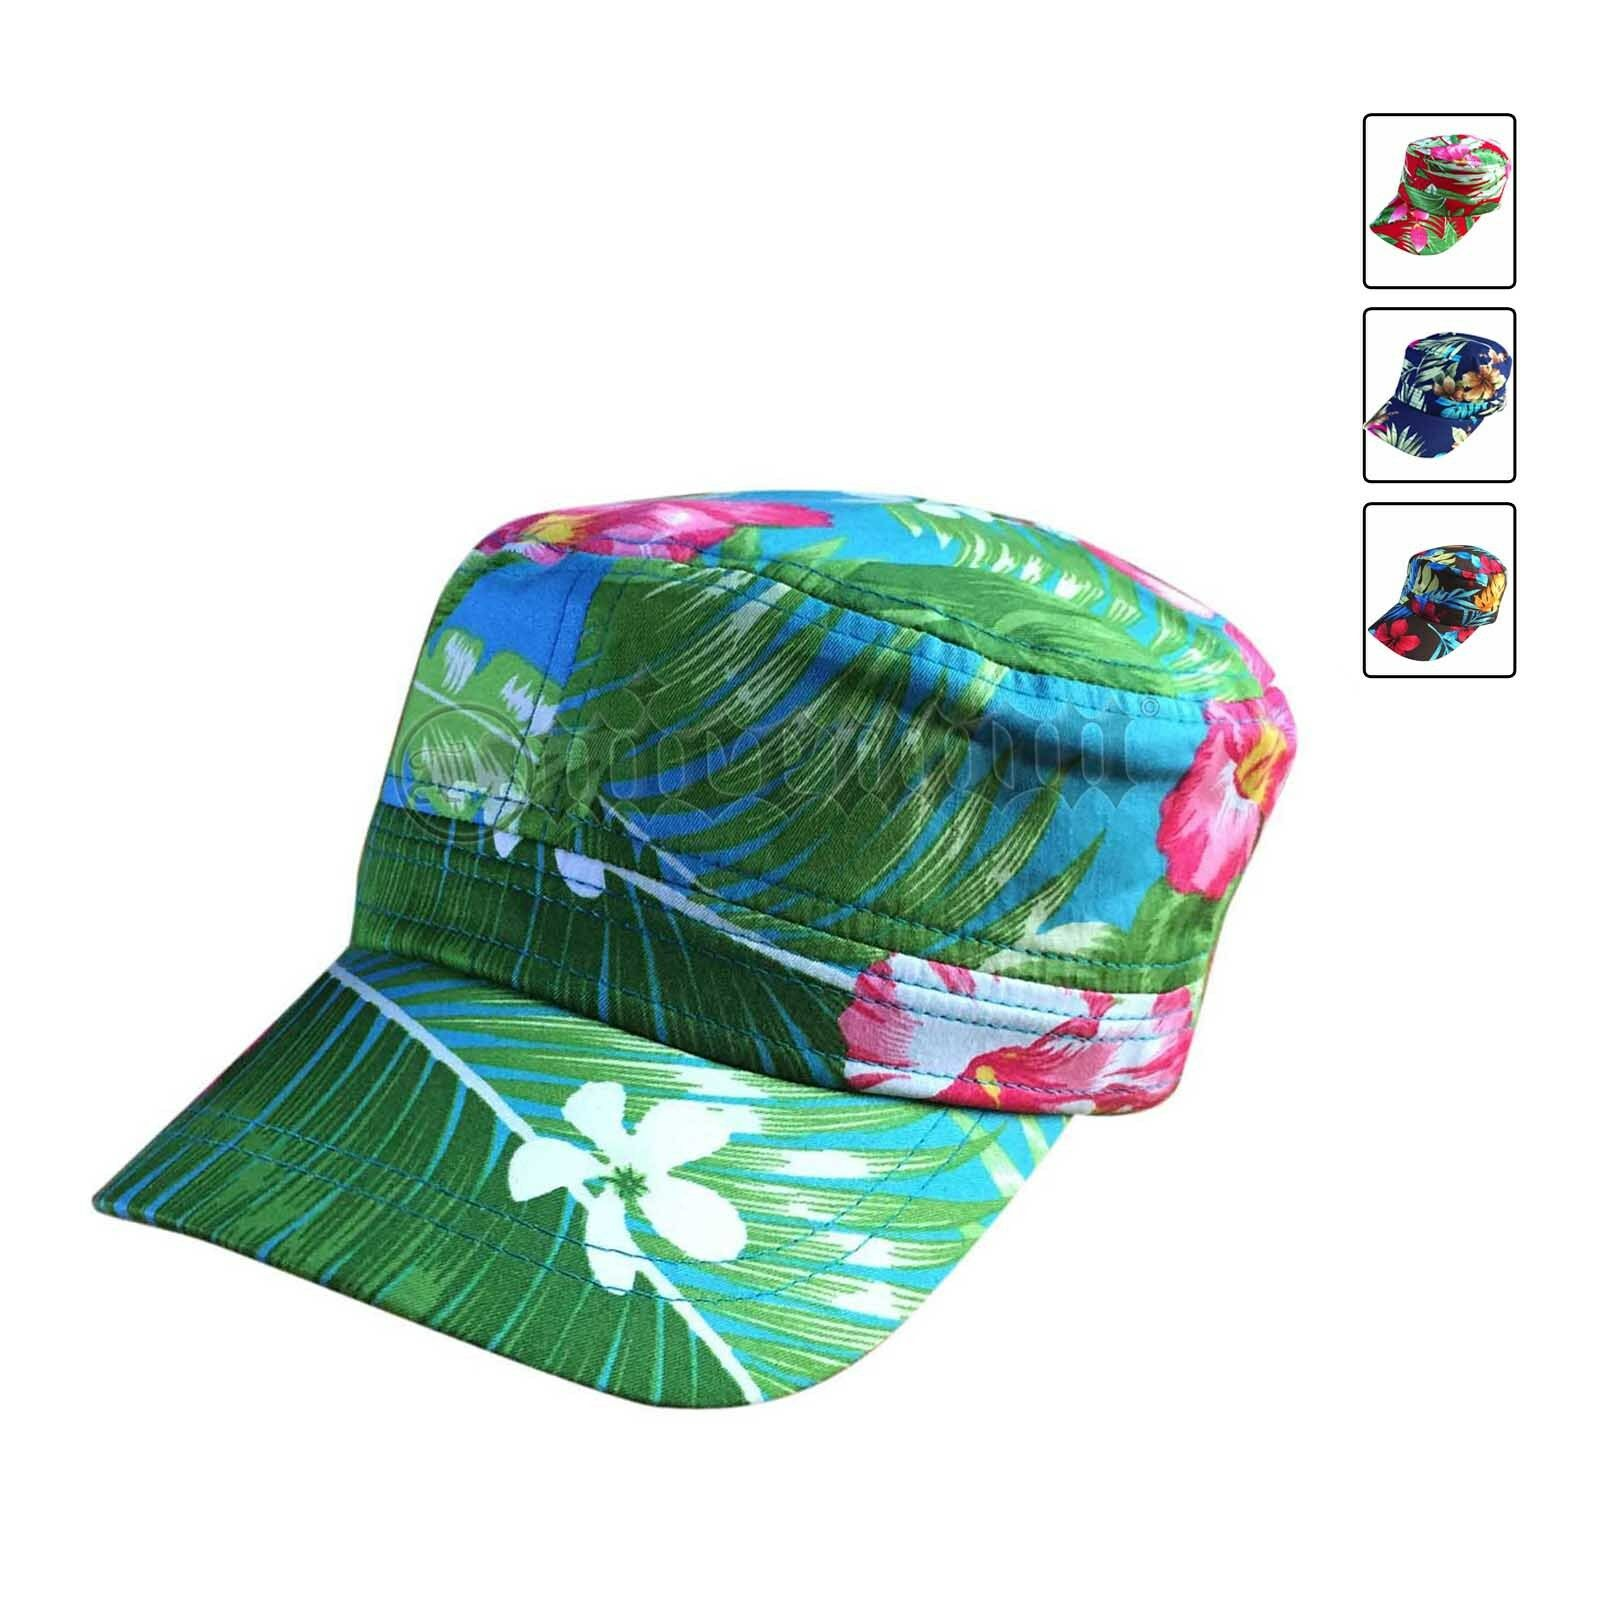 Blumenmuster Kadett Kappe Militär Stil Hut Armee Jamaica Hawaii Fiji1sz Passform